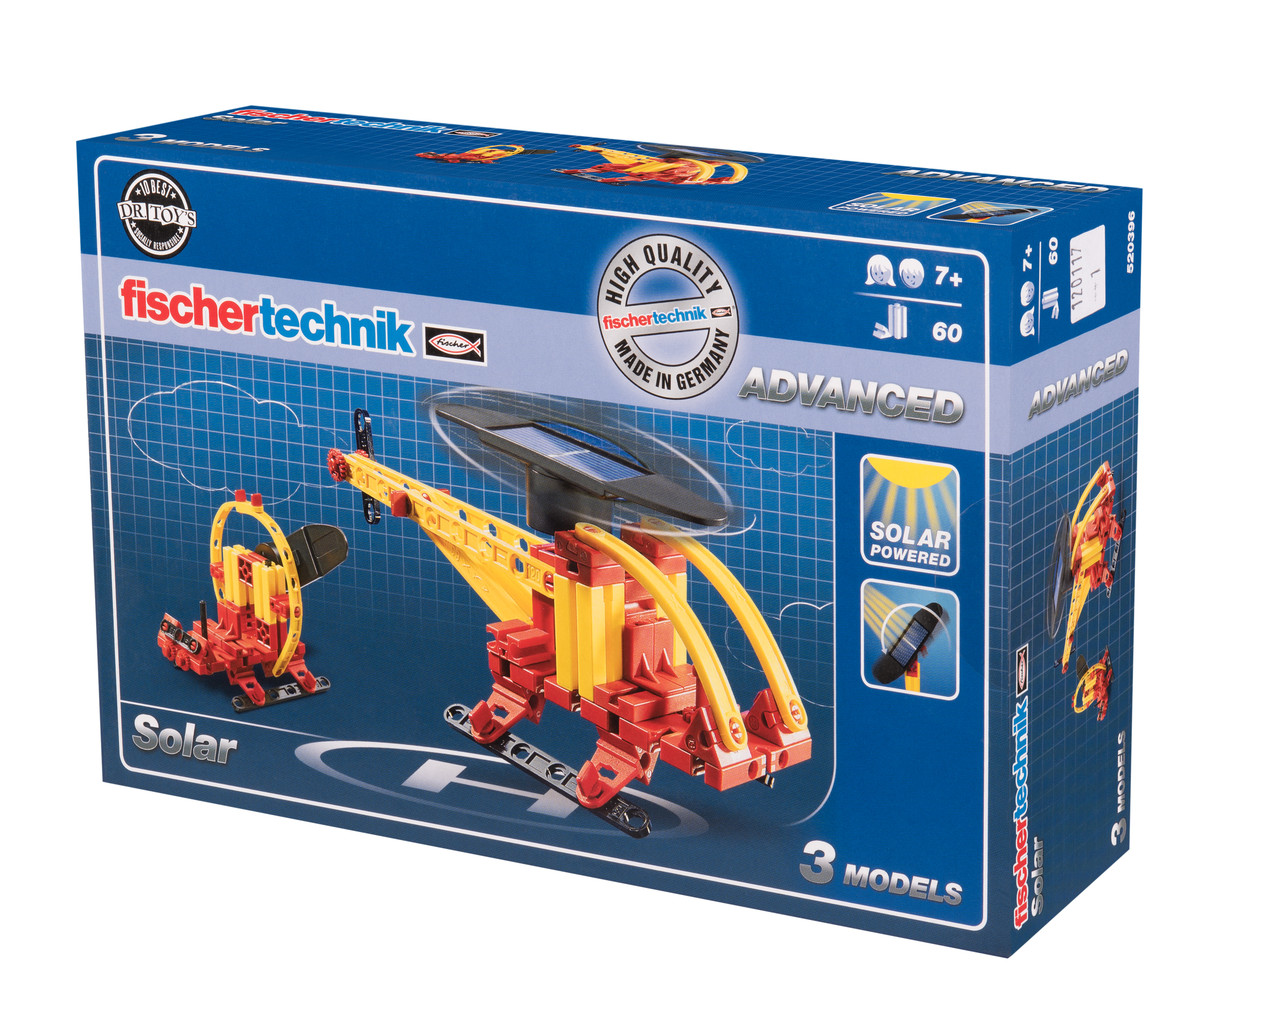 Конструктор Fisсhertechnik ADVANCED Энергия солнца (FT-520396)